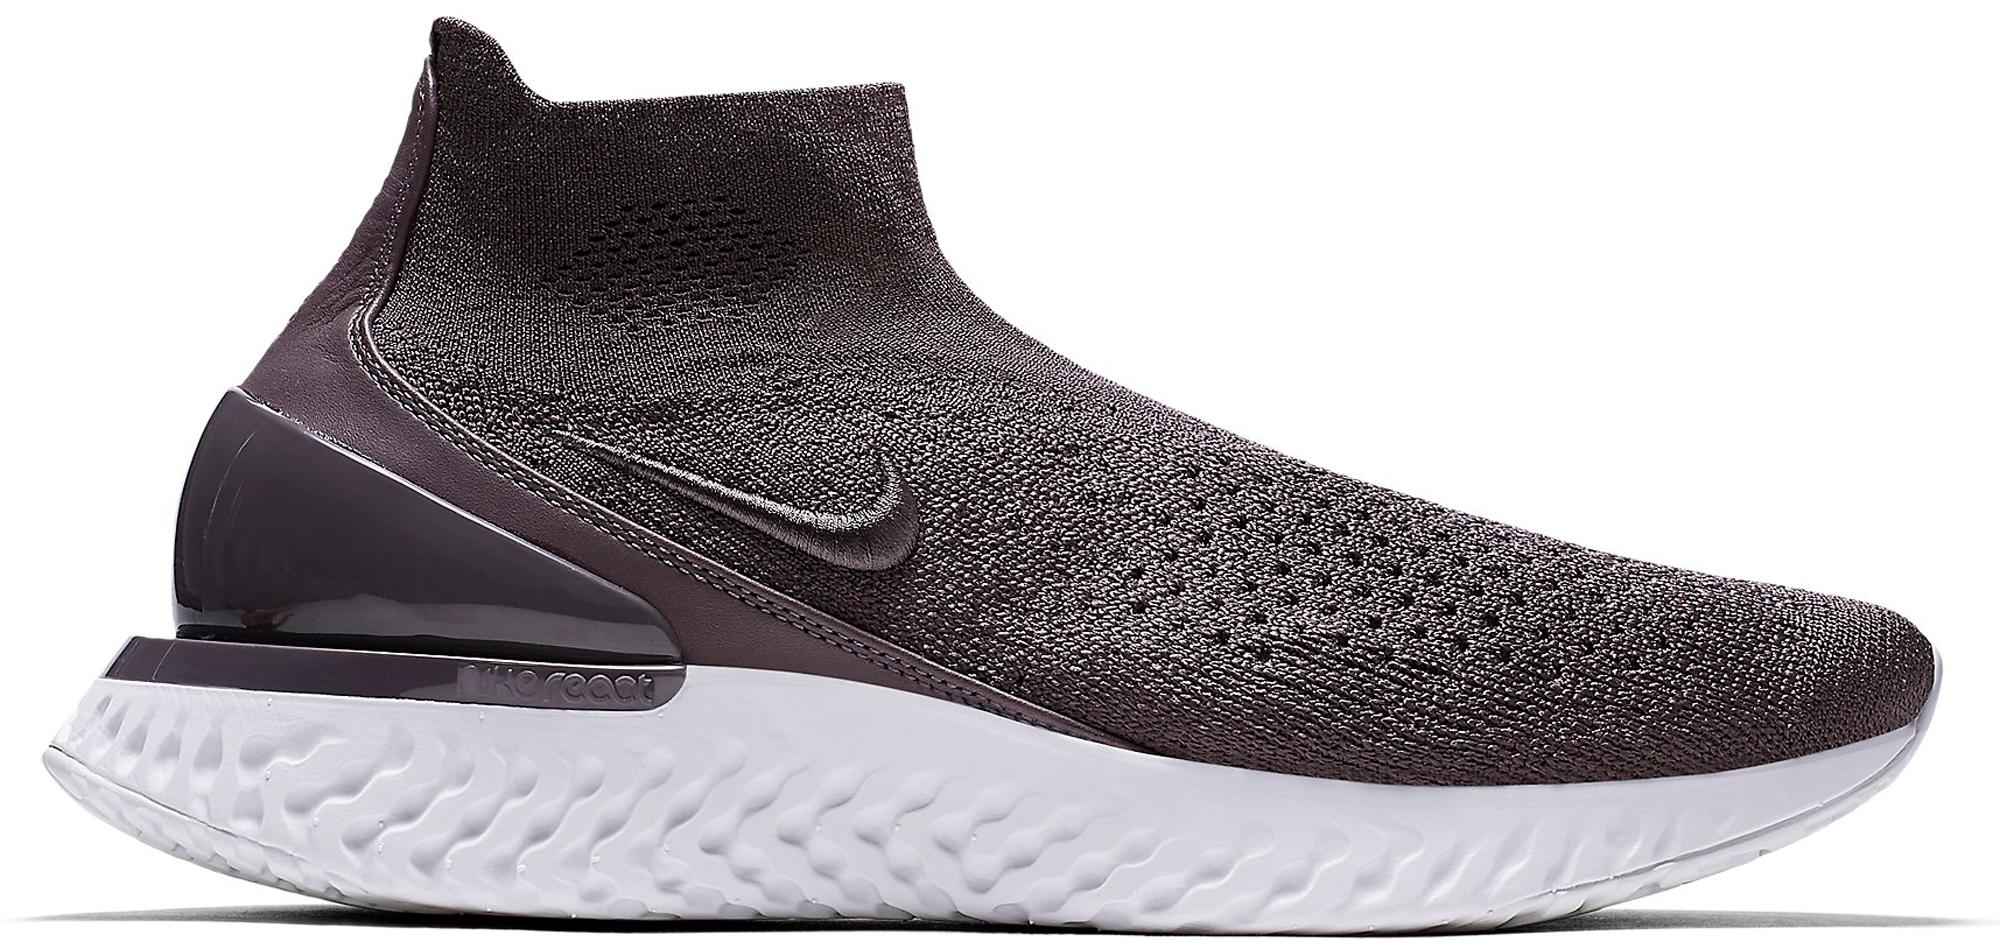 Nike Rise React Flyknit Thunder Grey